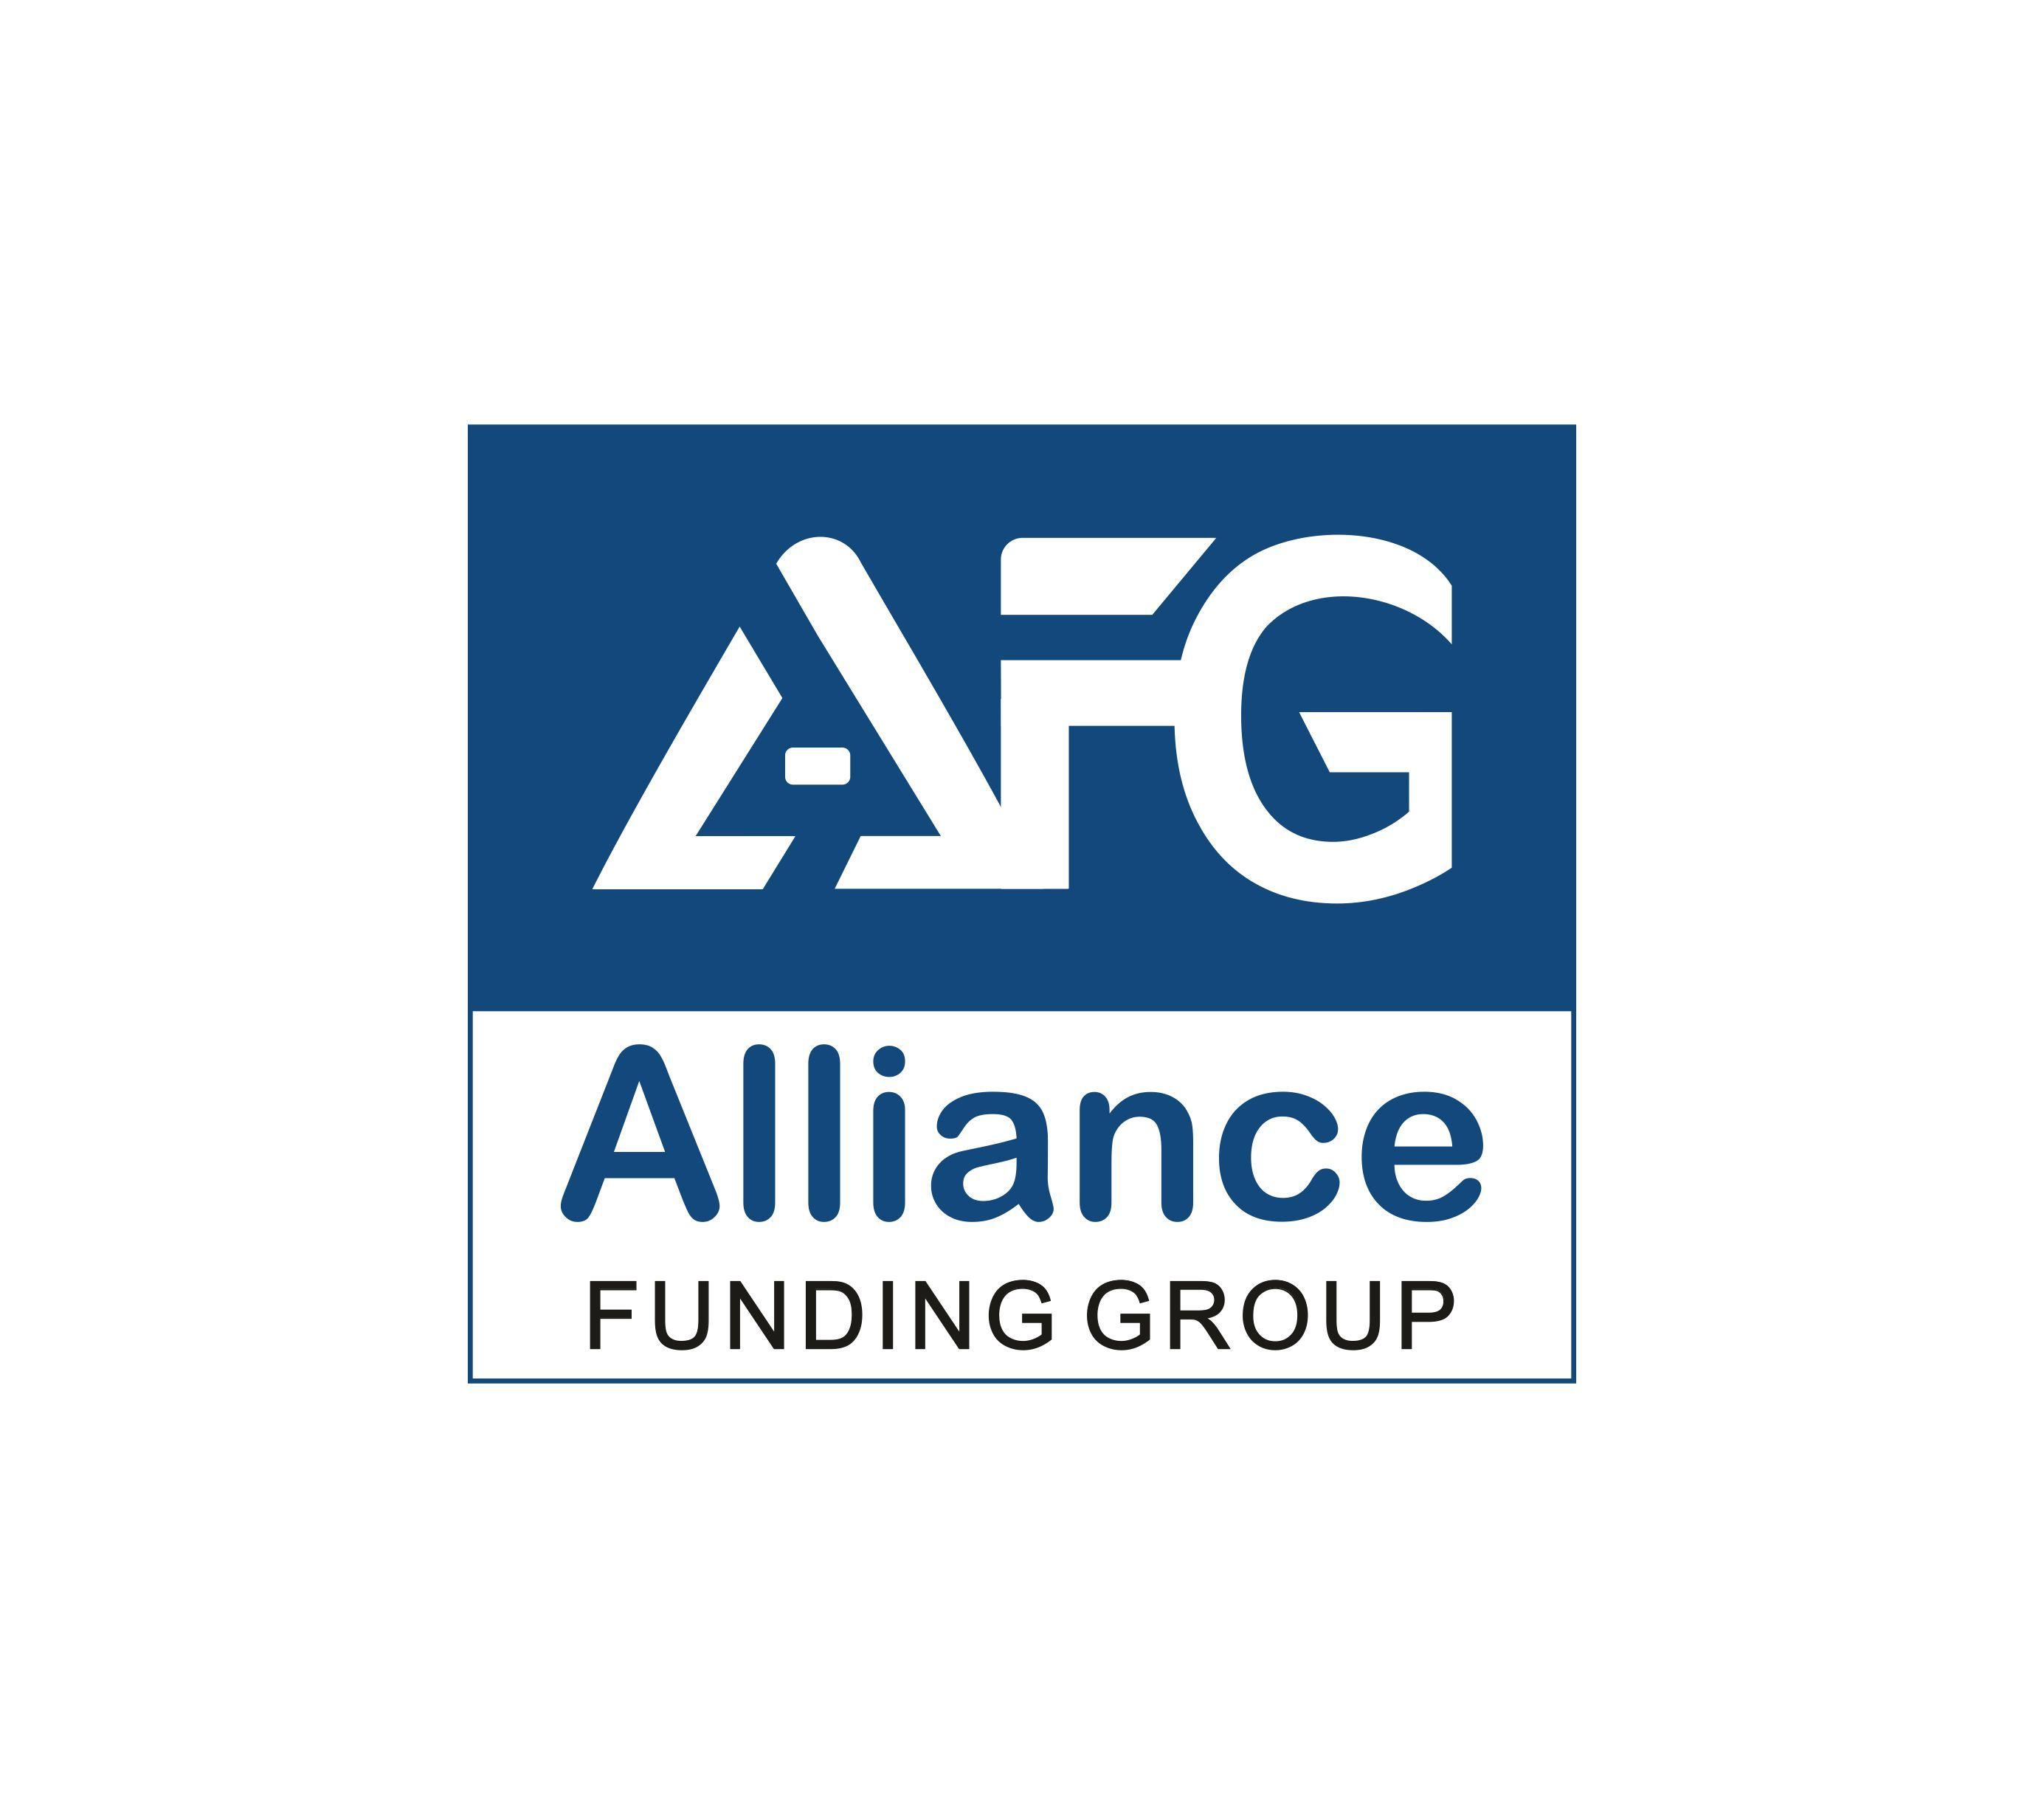 Alliance creative work allianz logo logos